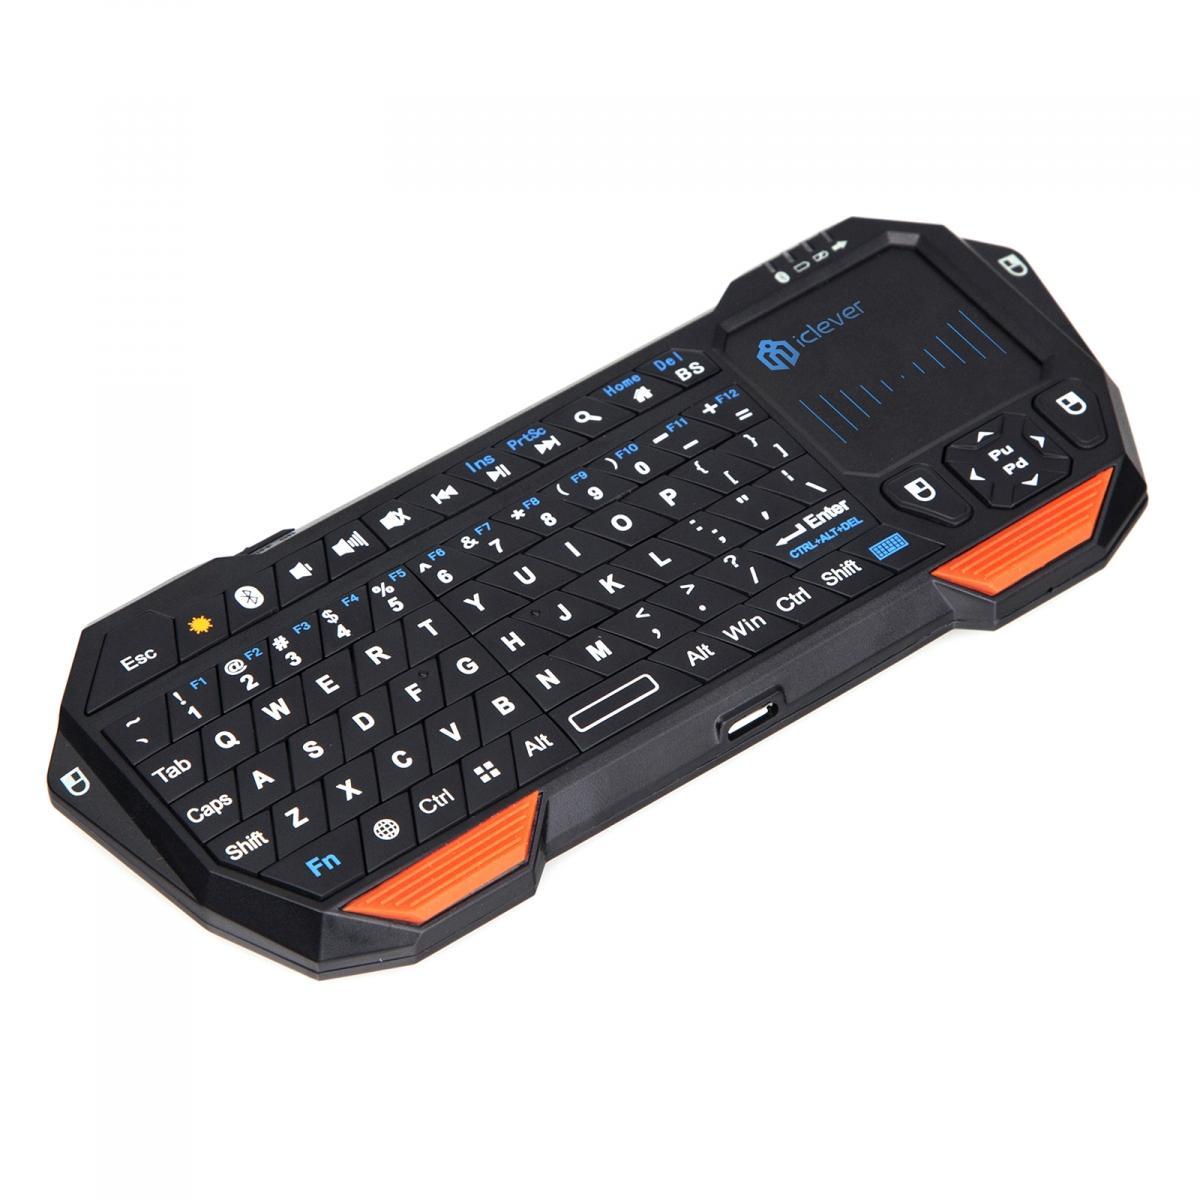 Mini Bluetooth Keyboard Is11 Bt05 Price In Pakistan